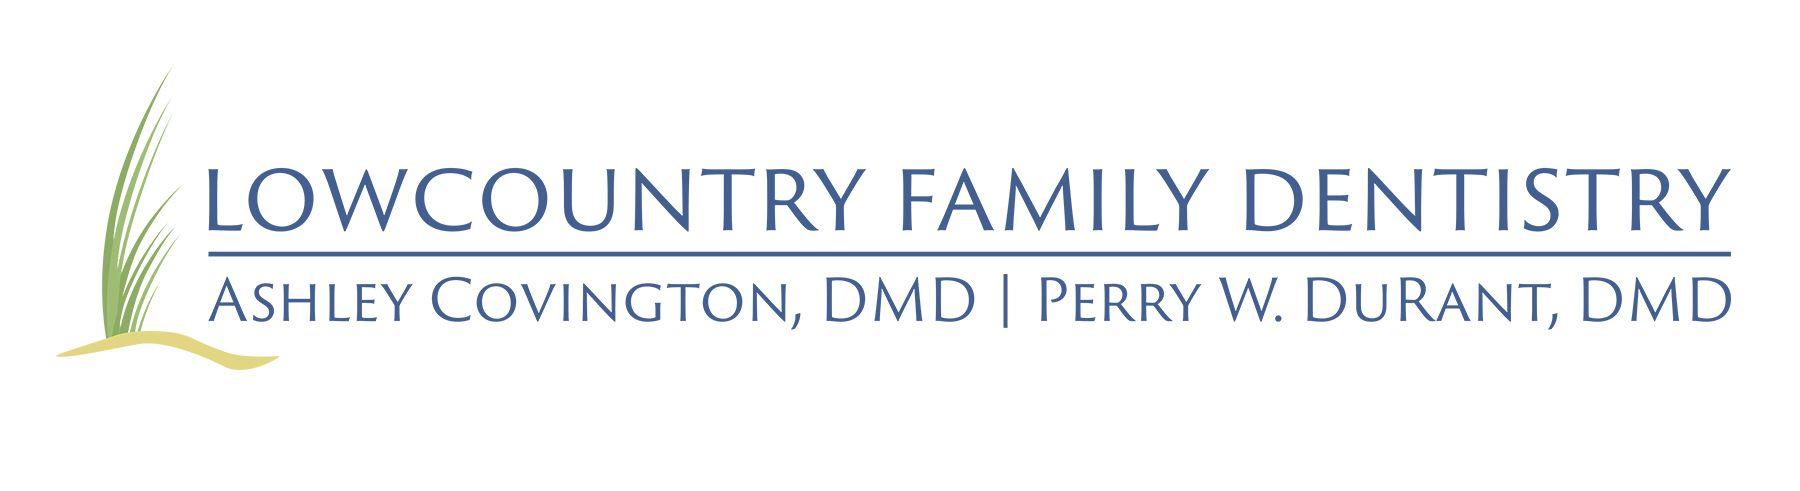 Lowcountry Family Dentistry Logo